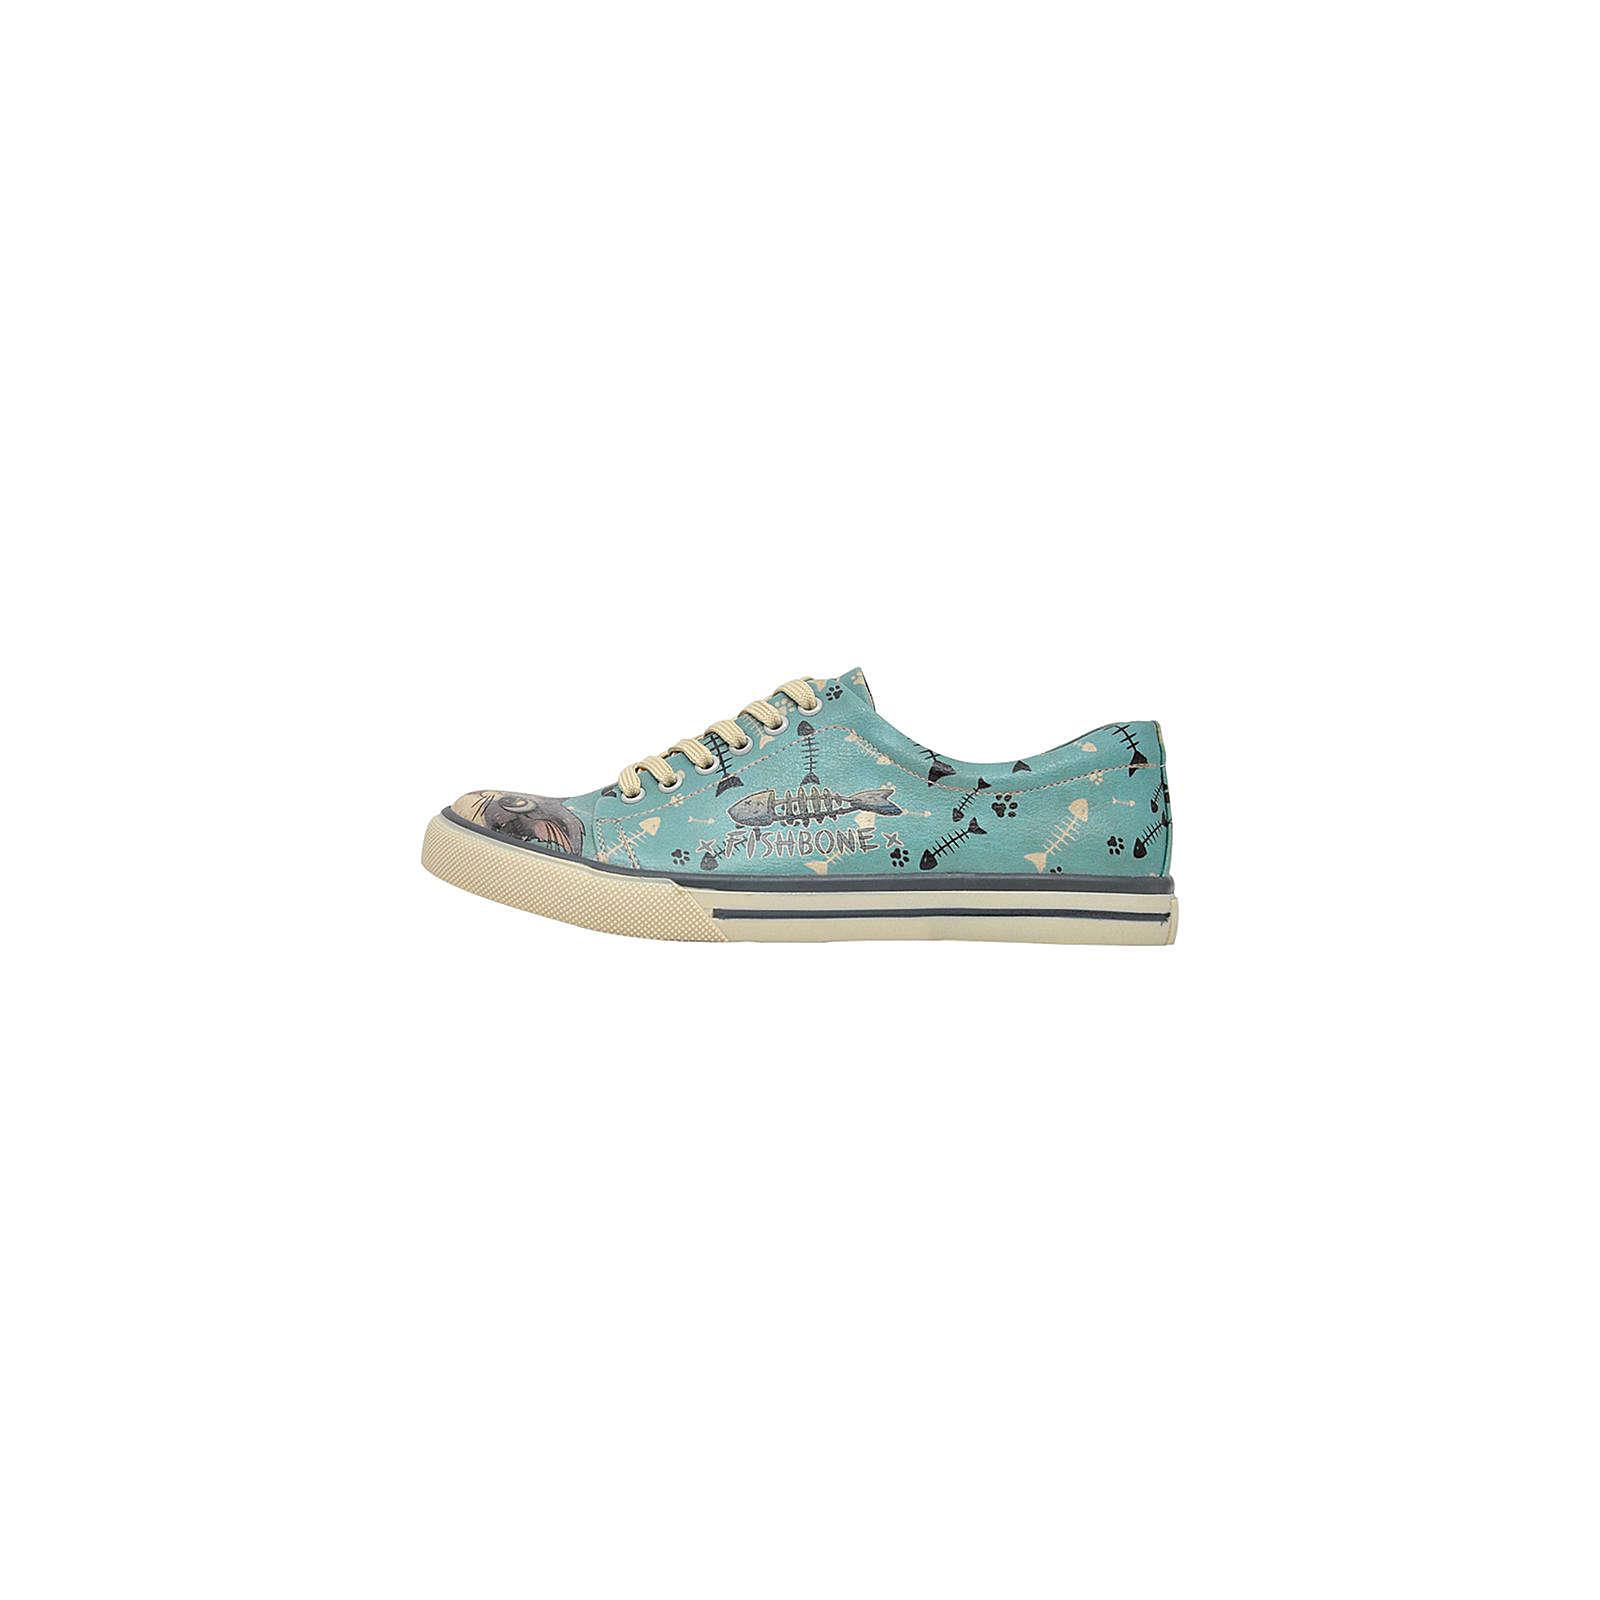 Dogo Shoes Sneakers Low Fishbone Lover mehrfarbig Damen Gr. 36